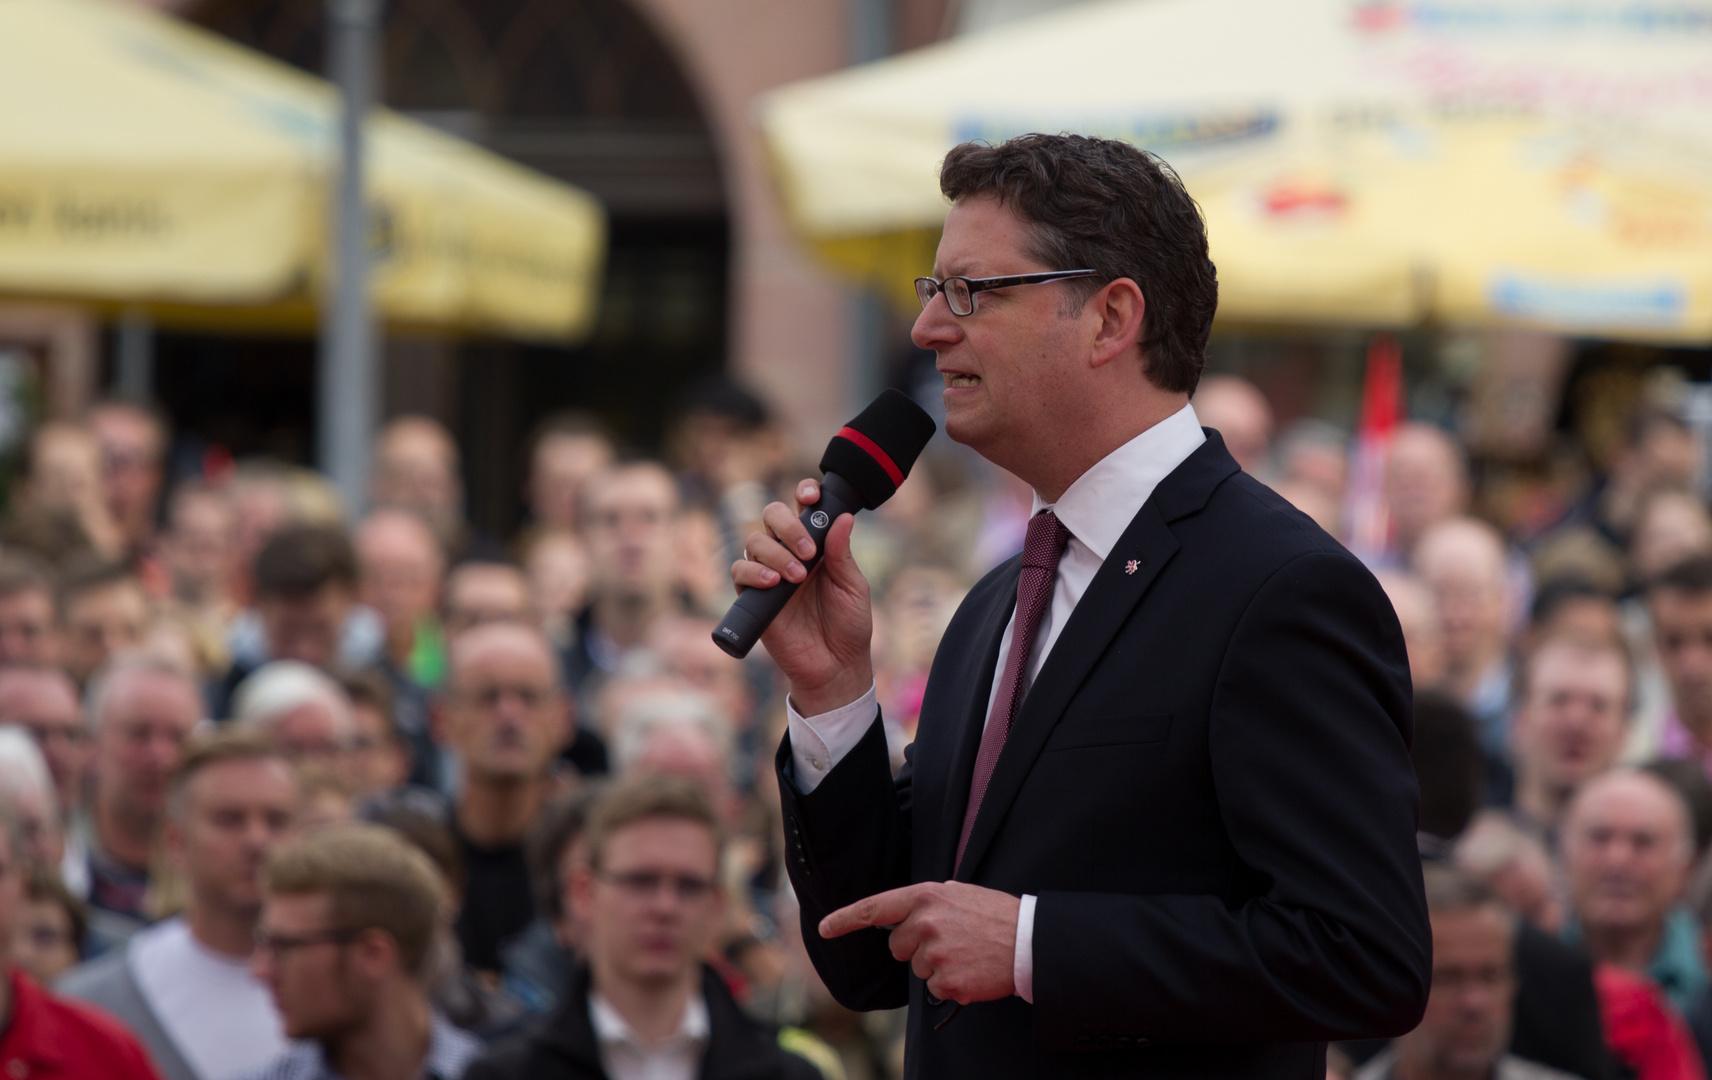 Torsten Schäfer-Gümbel (SPD) beim Wahlkampf in Frankfurt